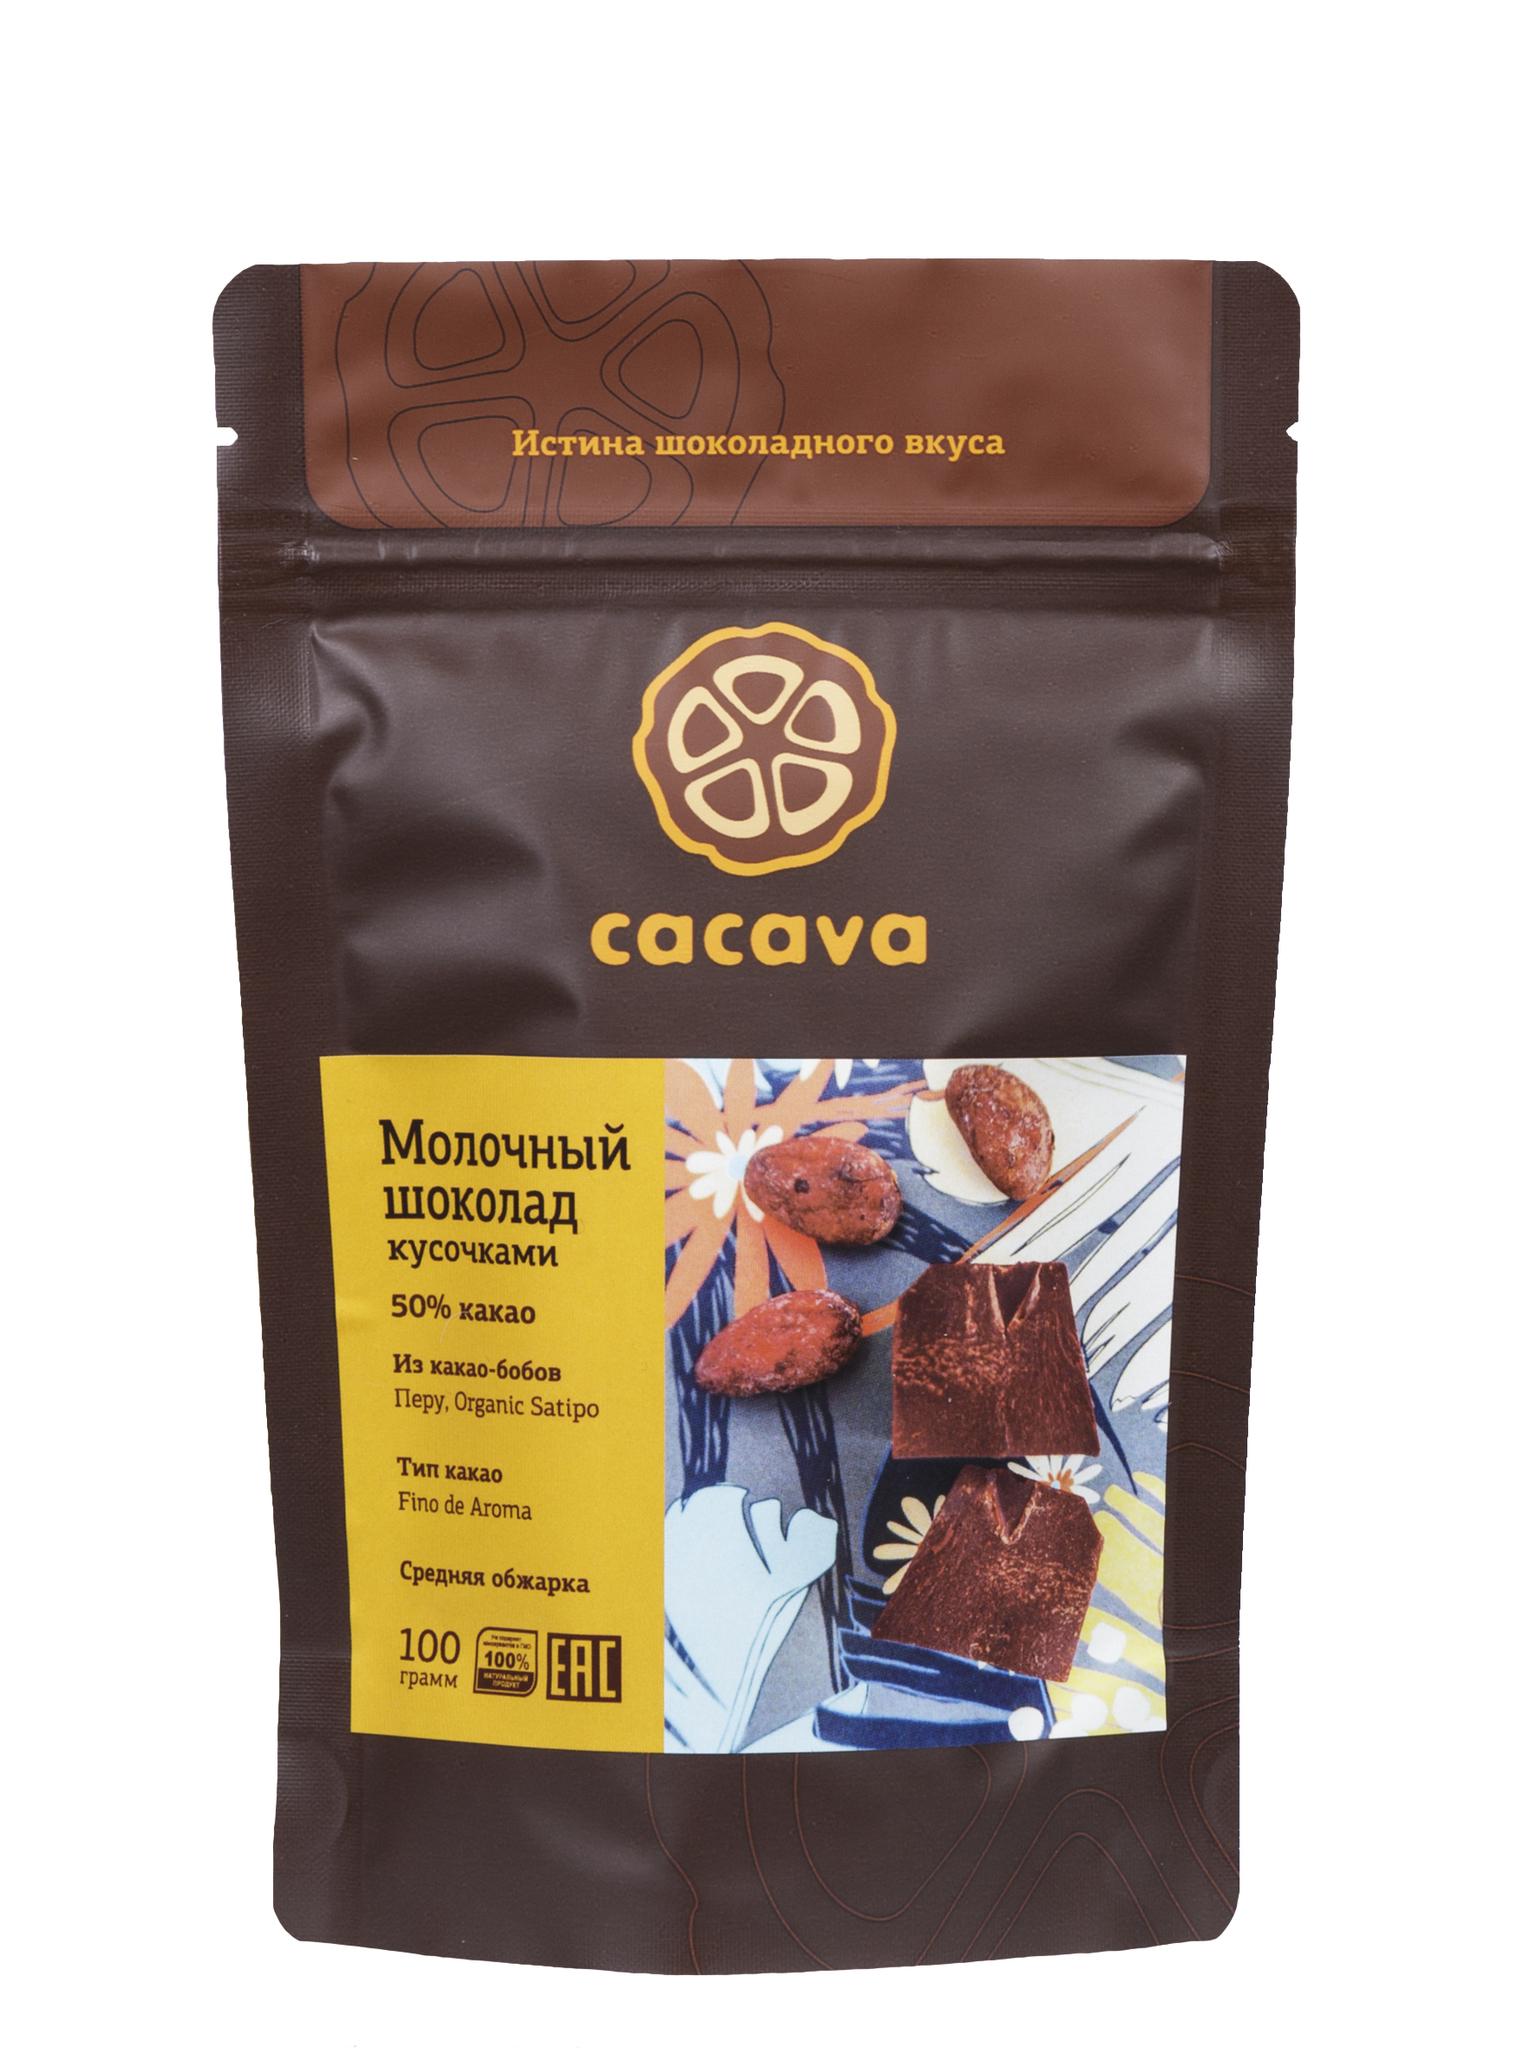 Молочный шоколад 50 % какао (Перу), упаковка 100 грамм